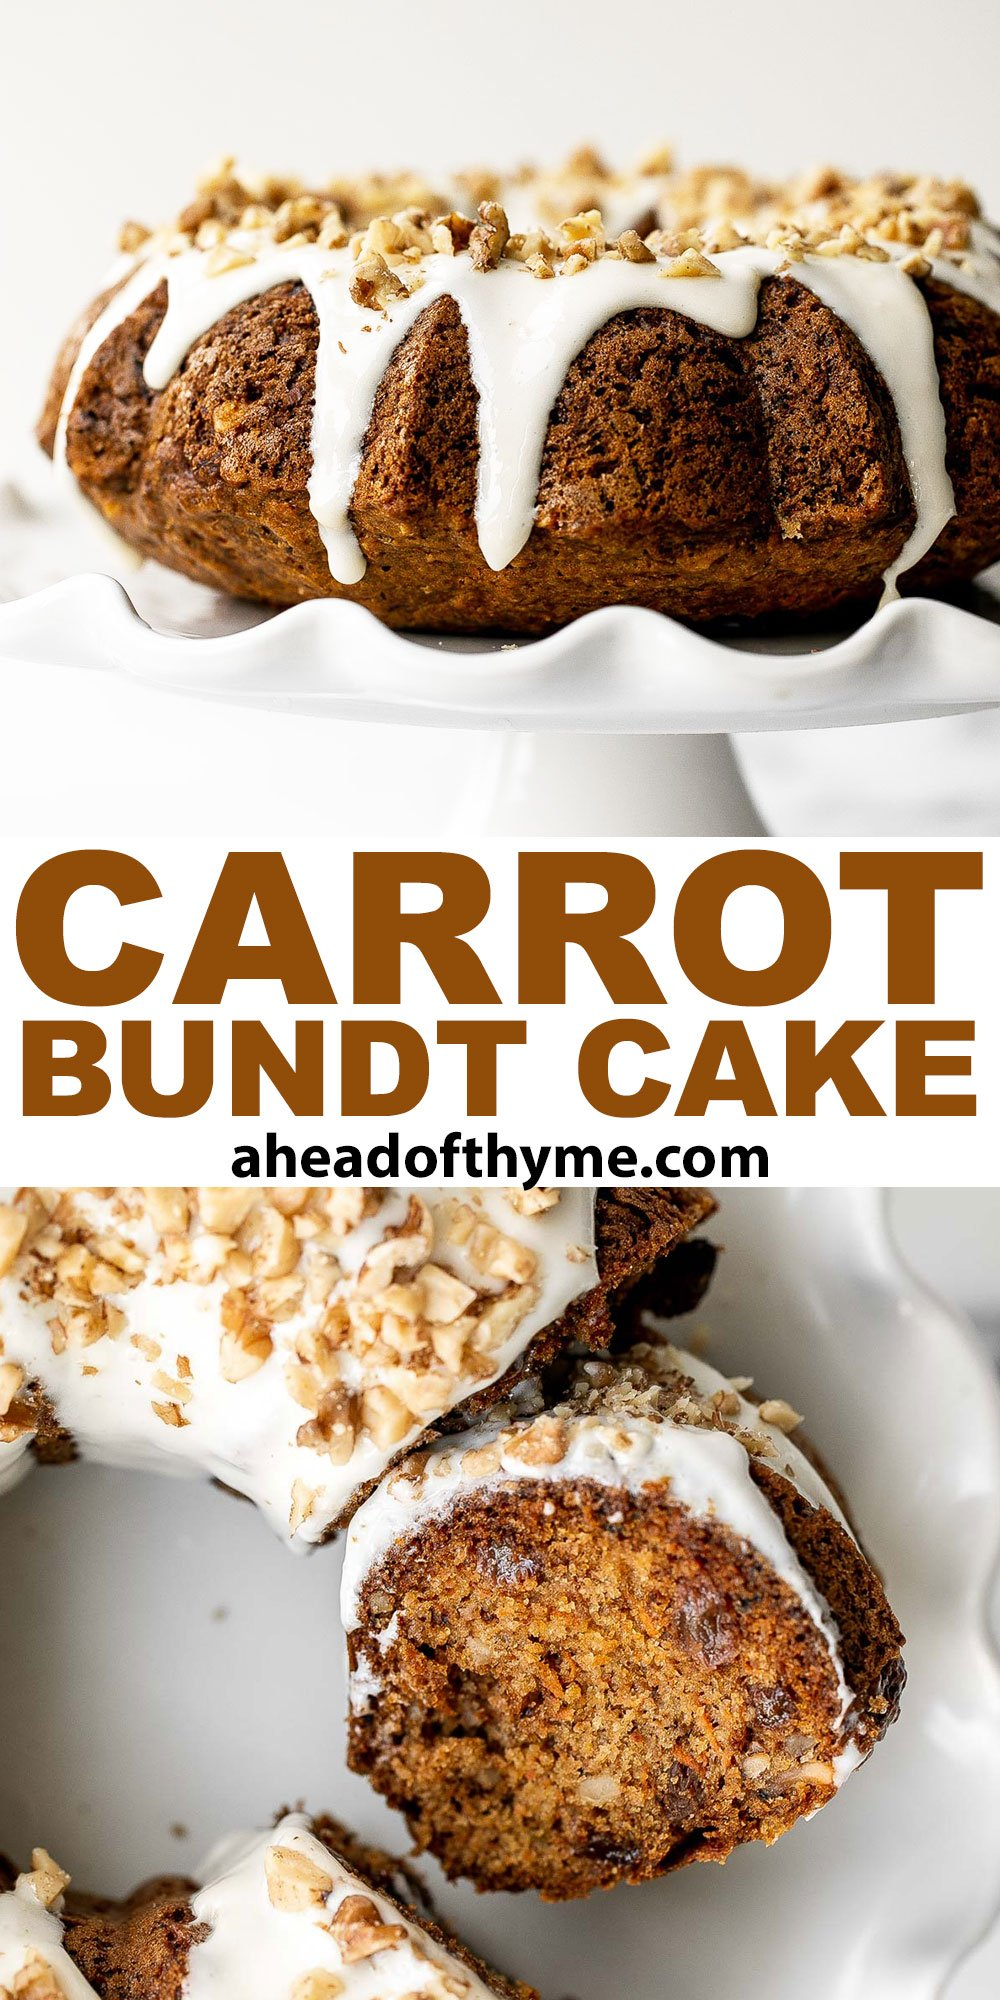 Carrot Bundt Cake with Cream Cheese Glaze